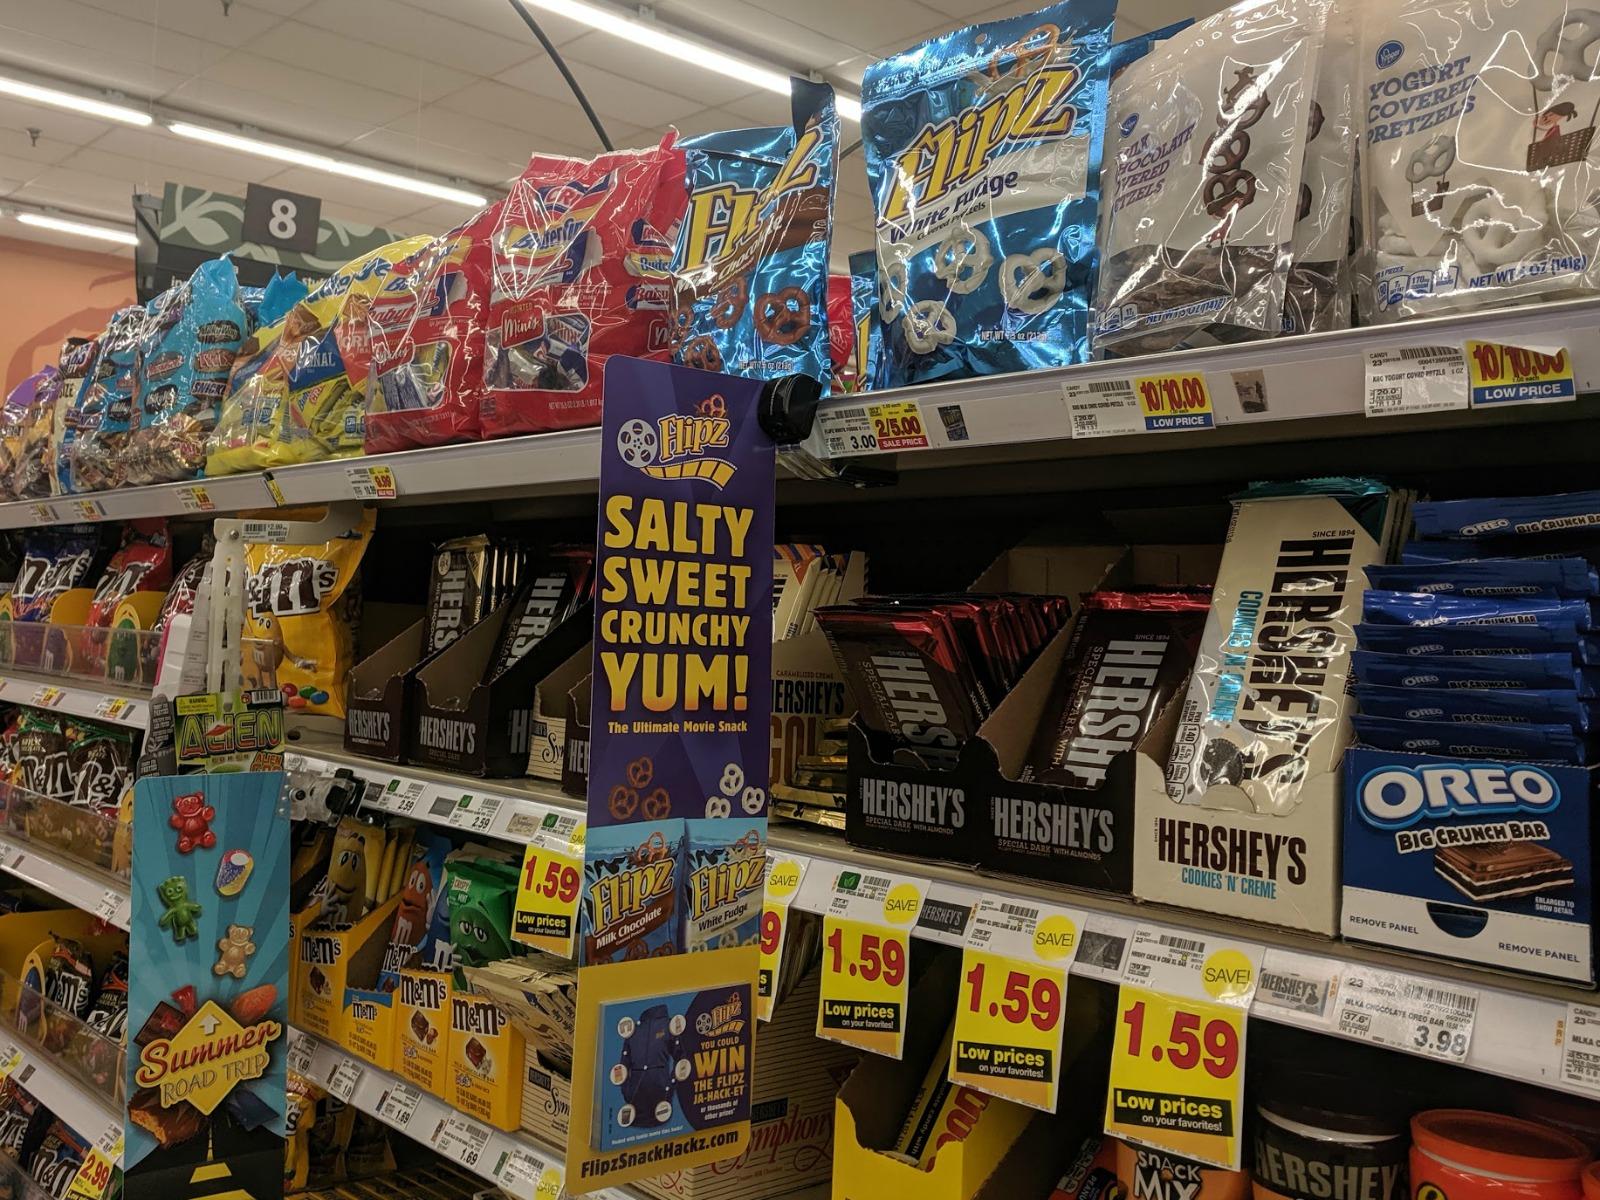 Stock Up On Your Favorite FLIPZ® Snacks At Kroger & Enter The FLIPZ® Summer Snack Hackz Instant Win Game